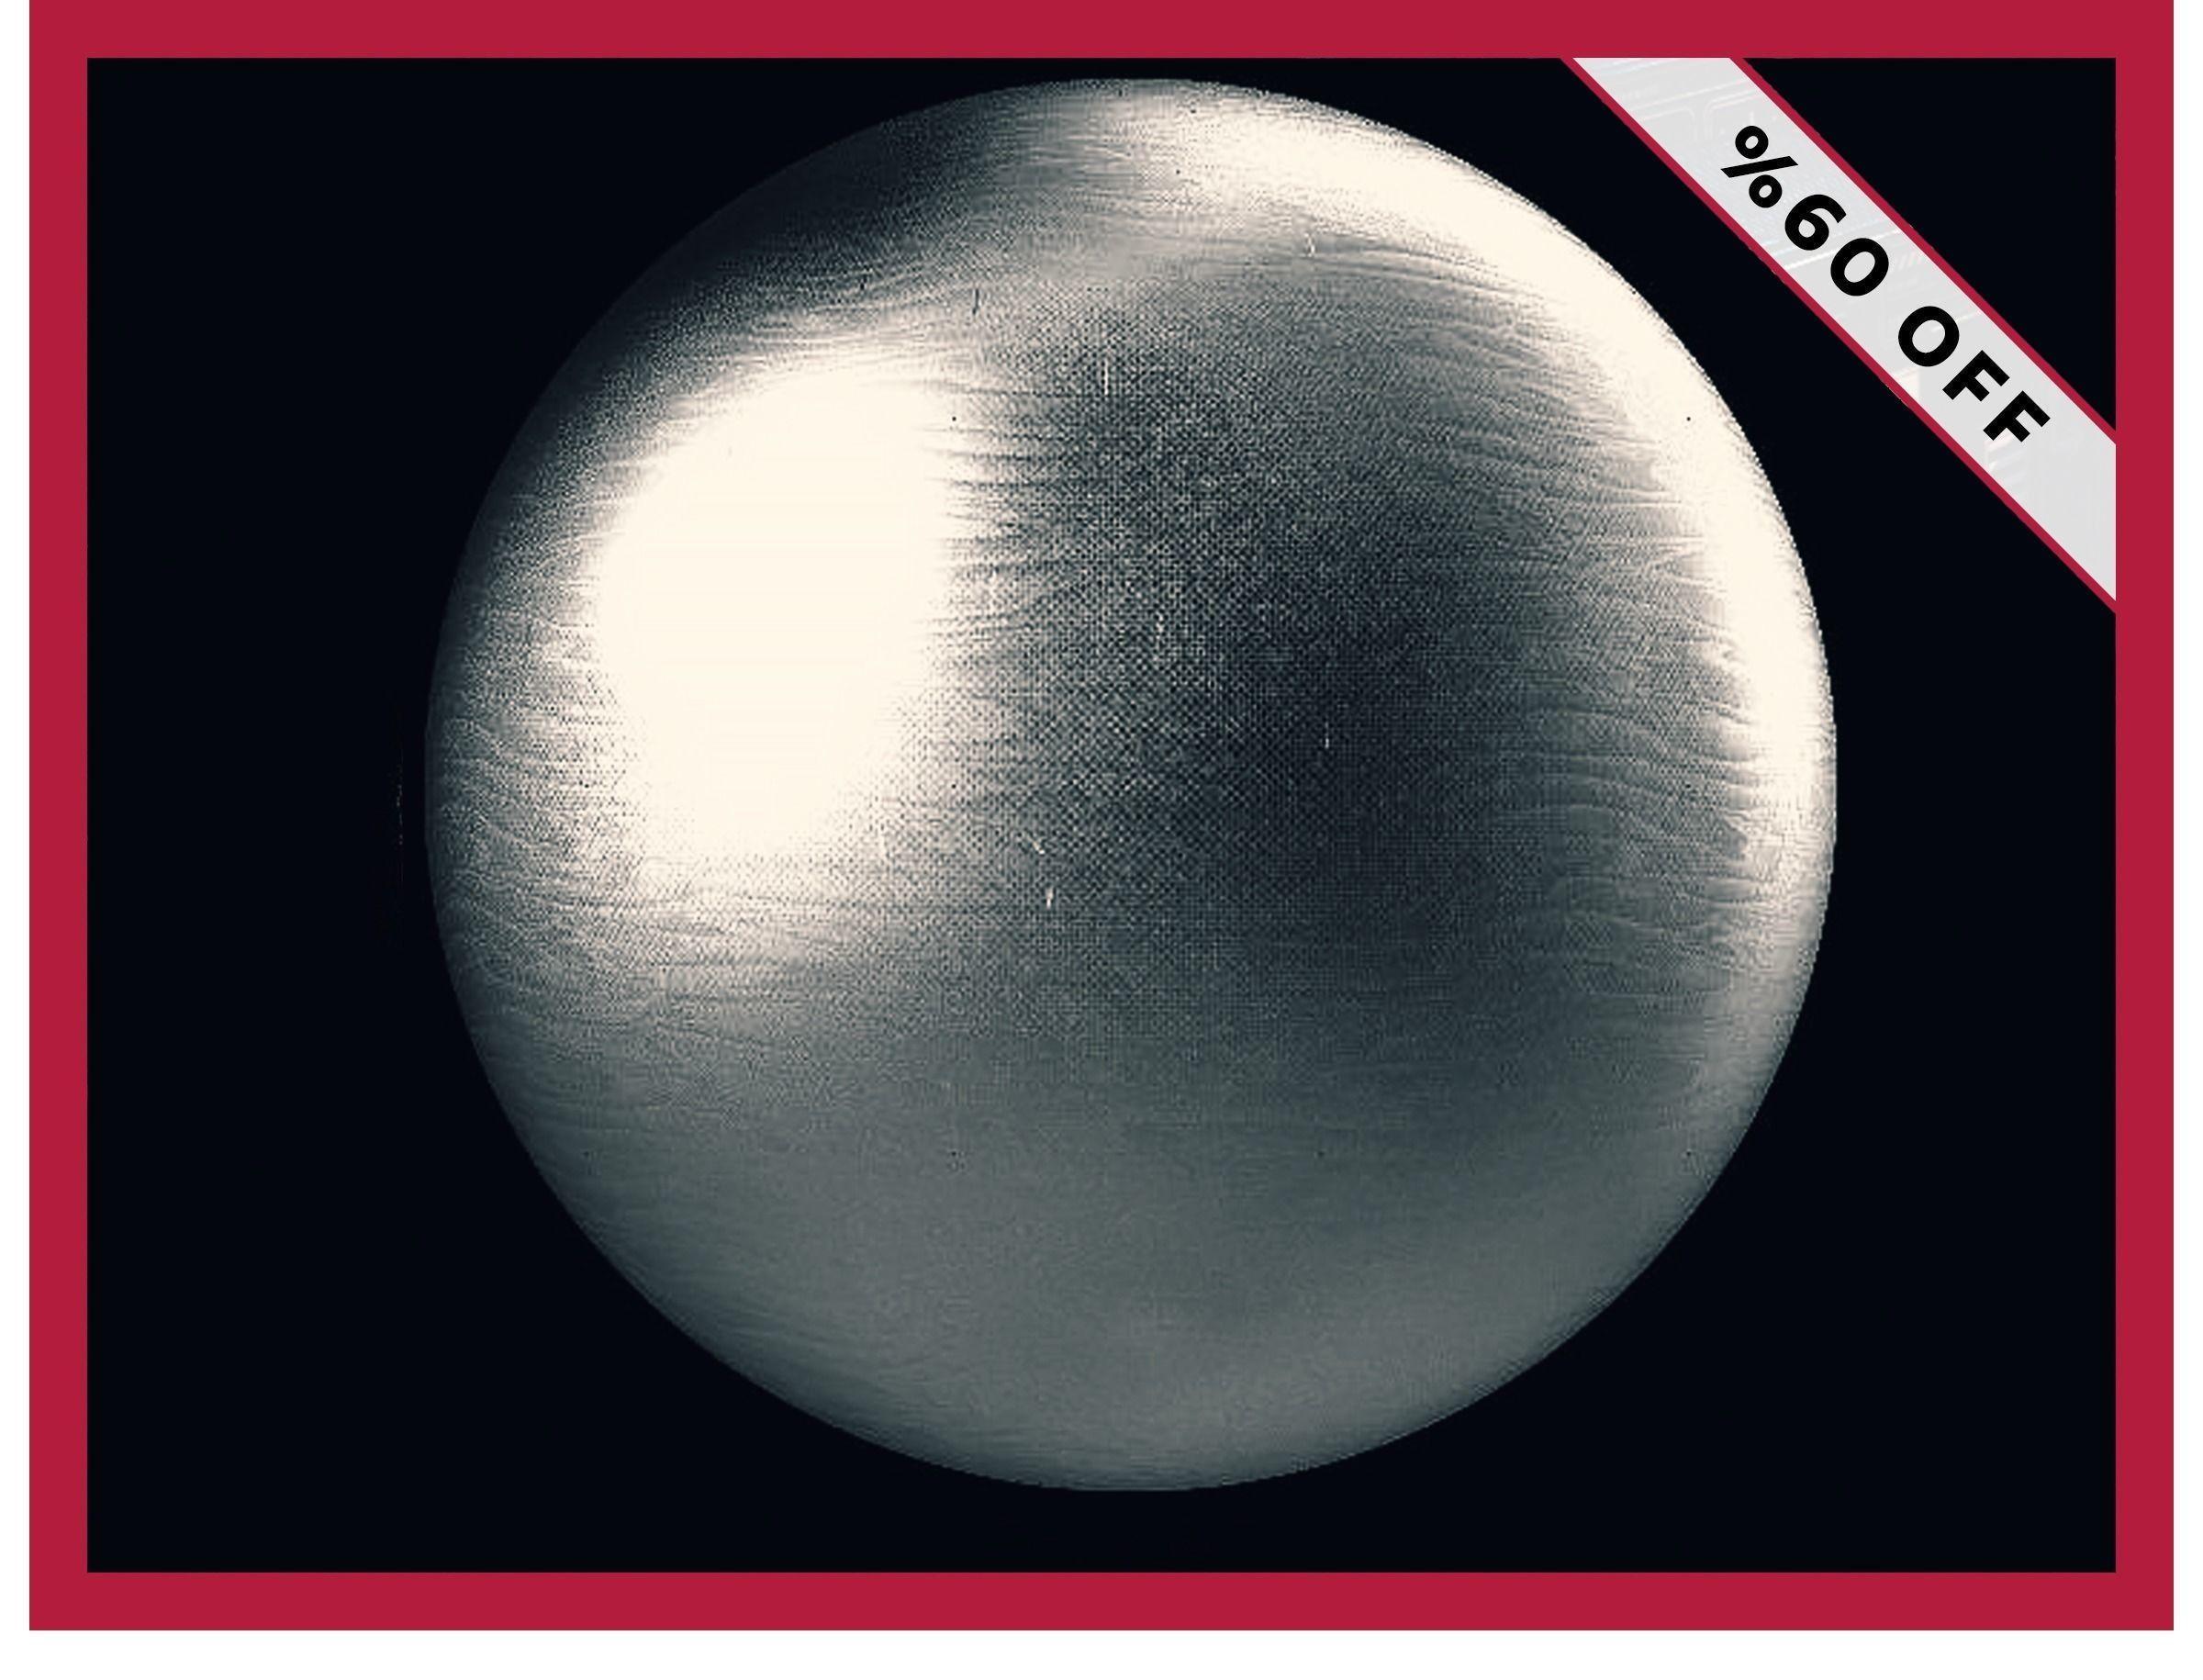 Metal Metallic Steel Seamless PBR Texture